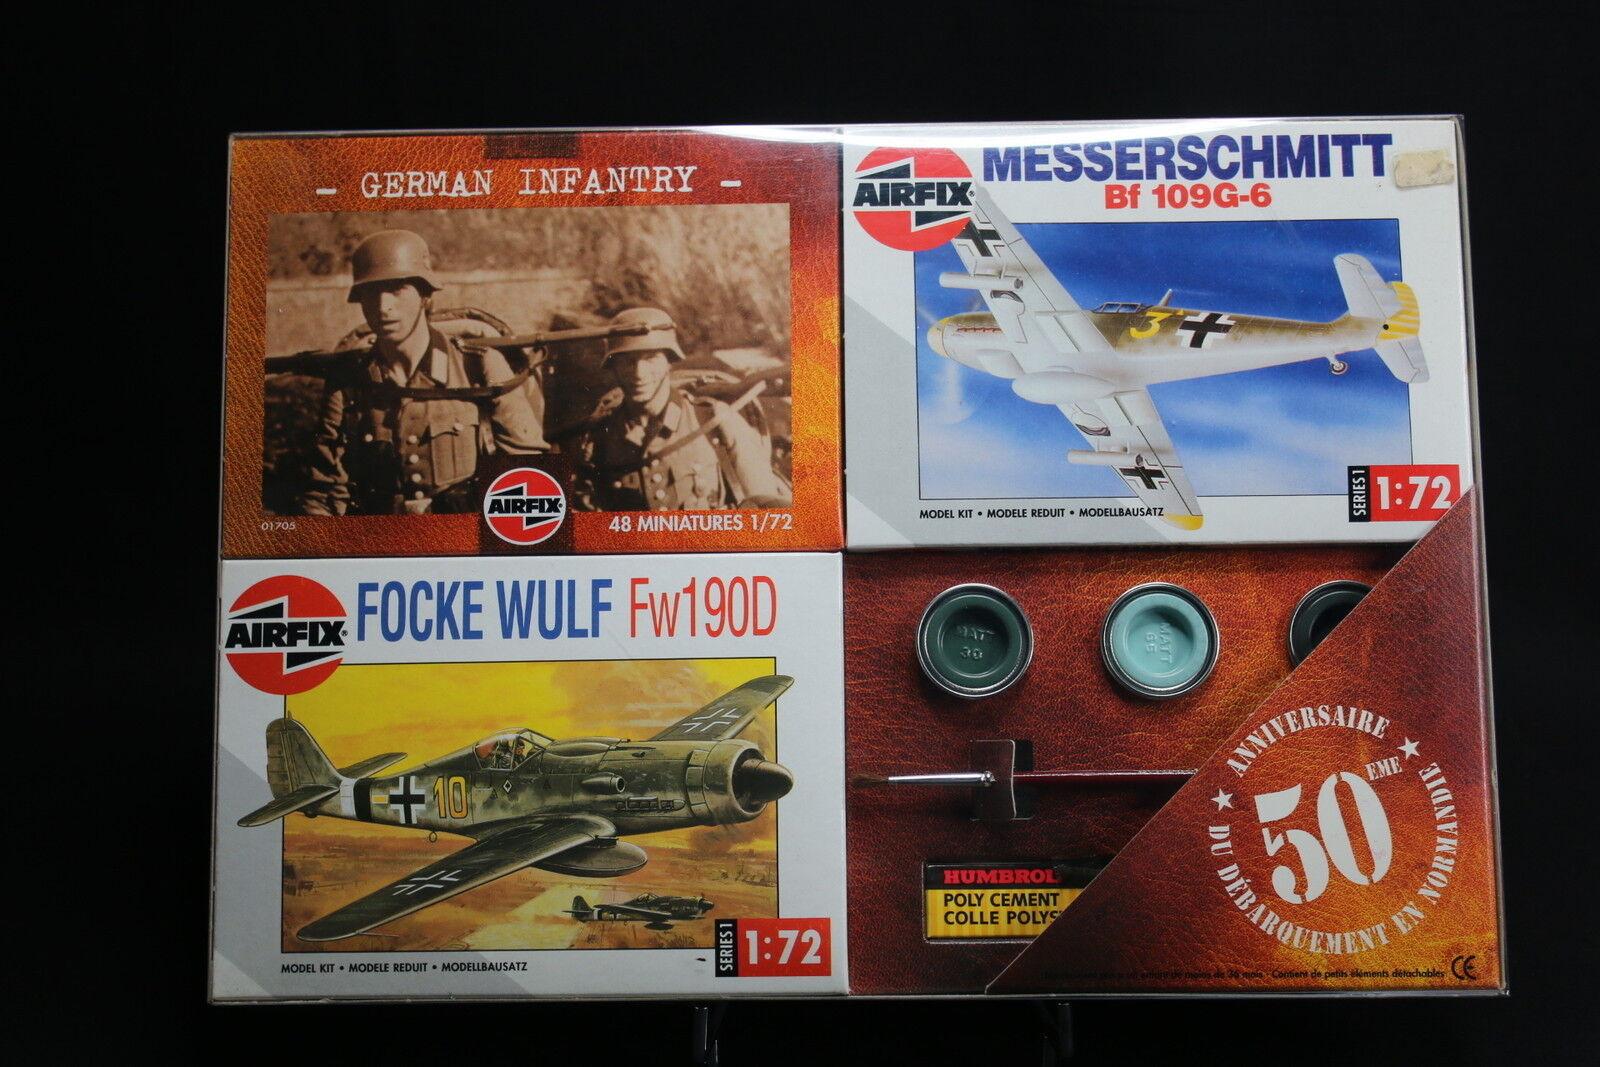 XM018 AIRFIX Collection Day 50 Anniversaire débarquement 01072 01064 01705 WWII